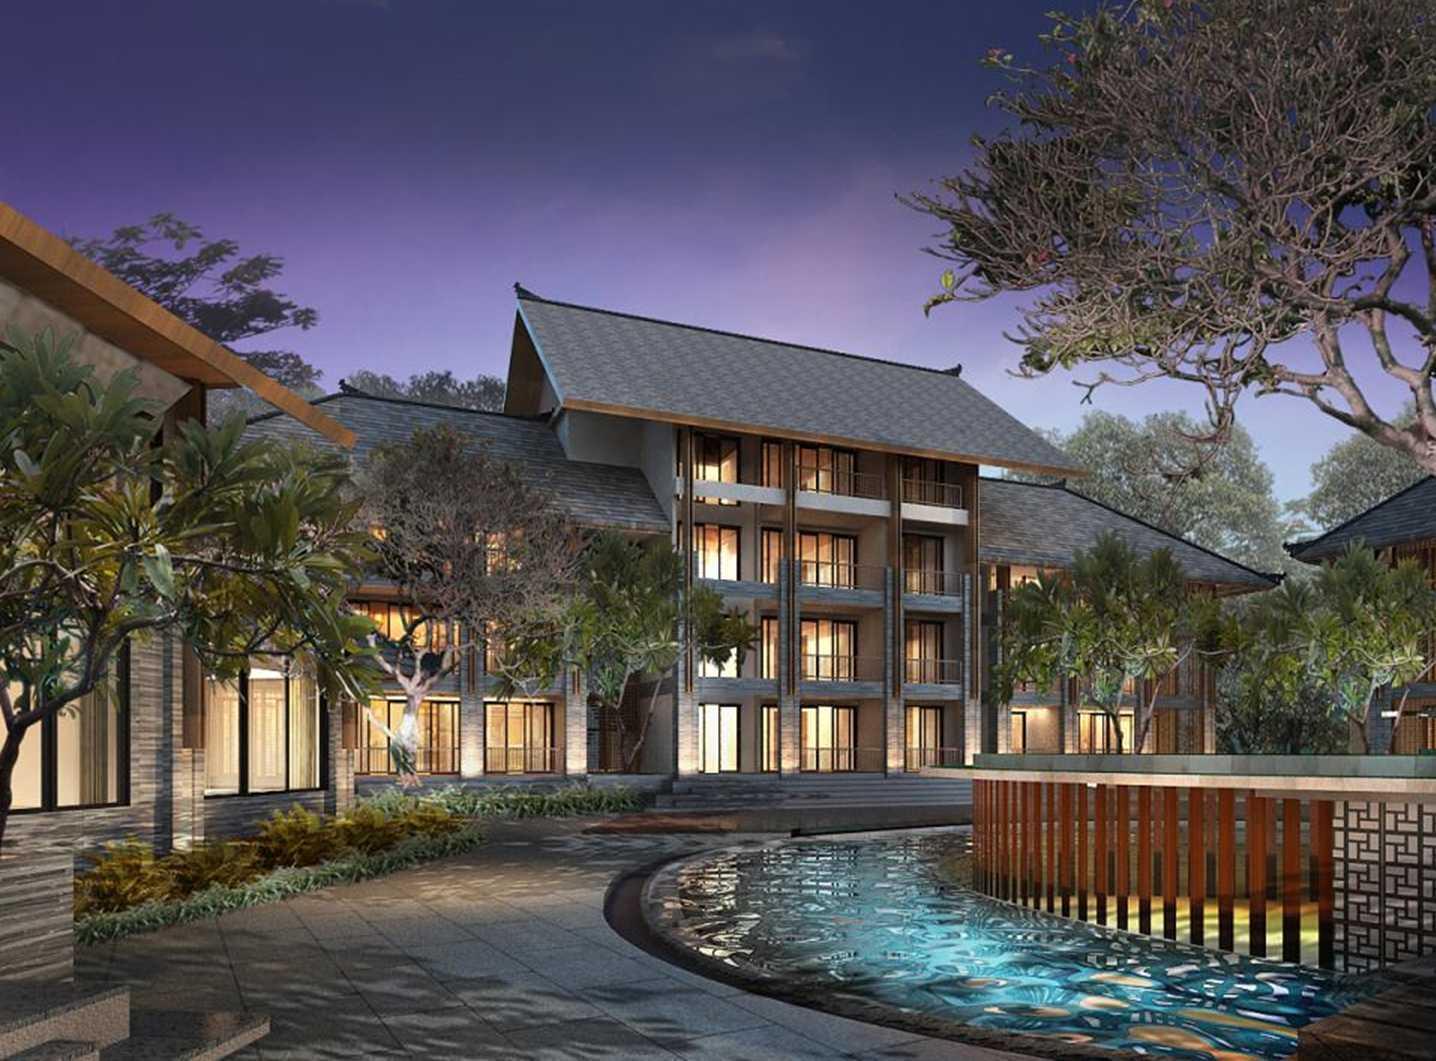 Wegig Pangauban - Wismaparamasiddha Marriott Vacation Club Bali  Bali  Image-2  22321